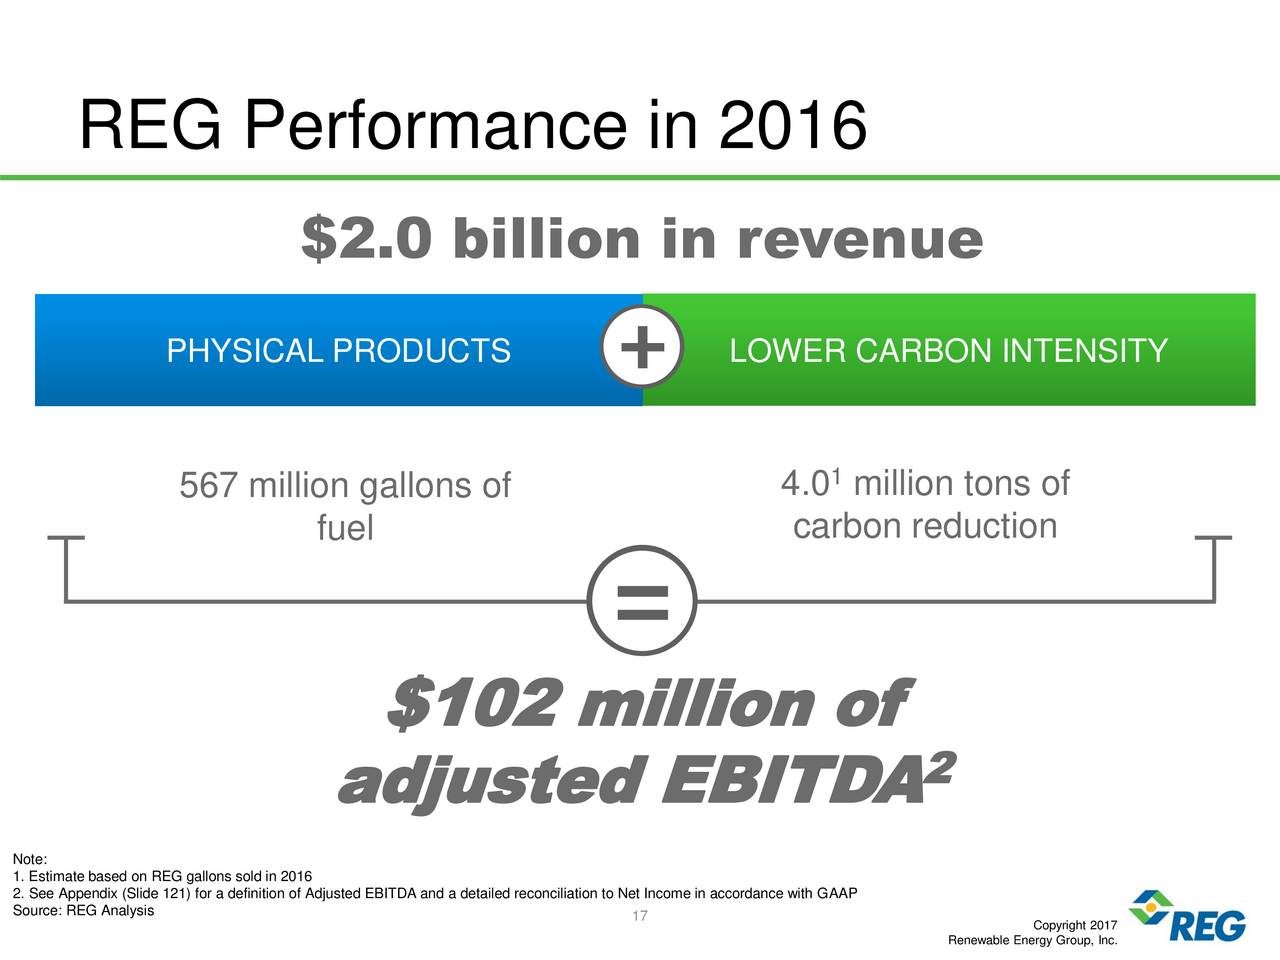 renewable energy group (regi) investor presentation - slideshow